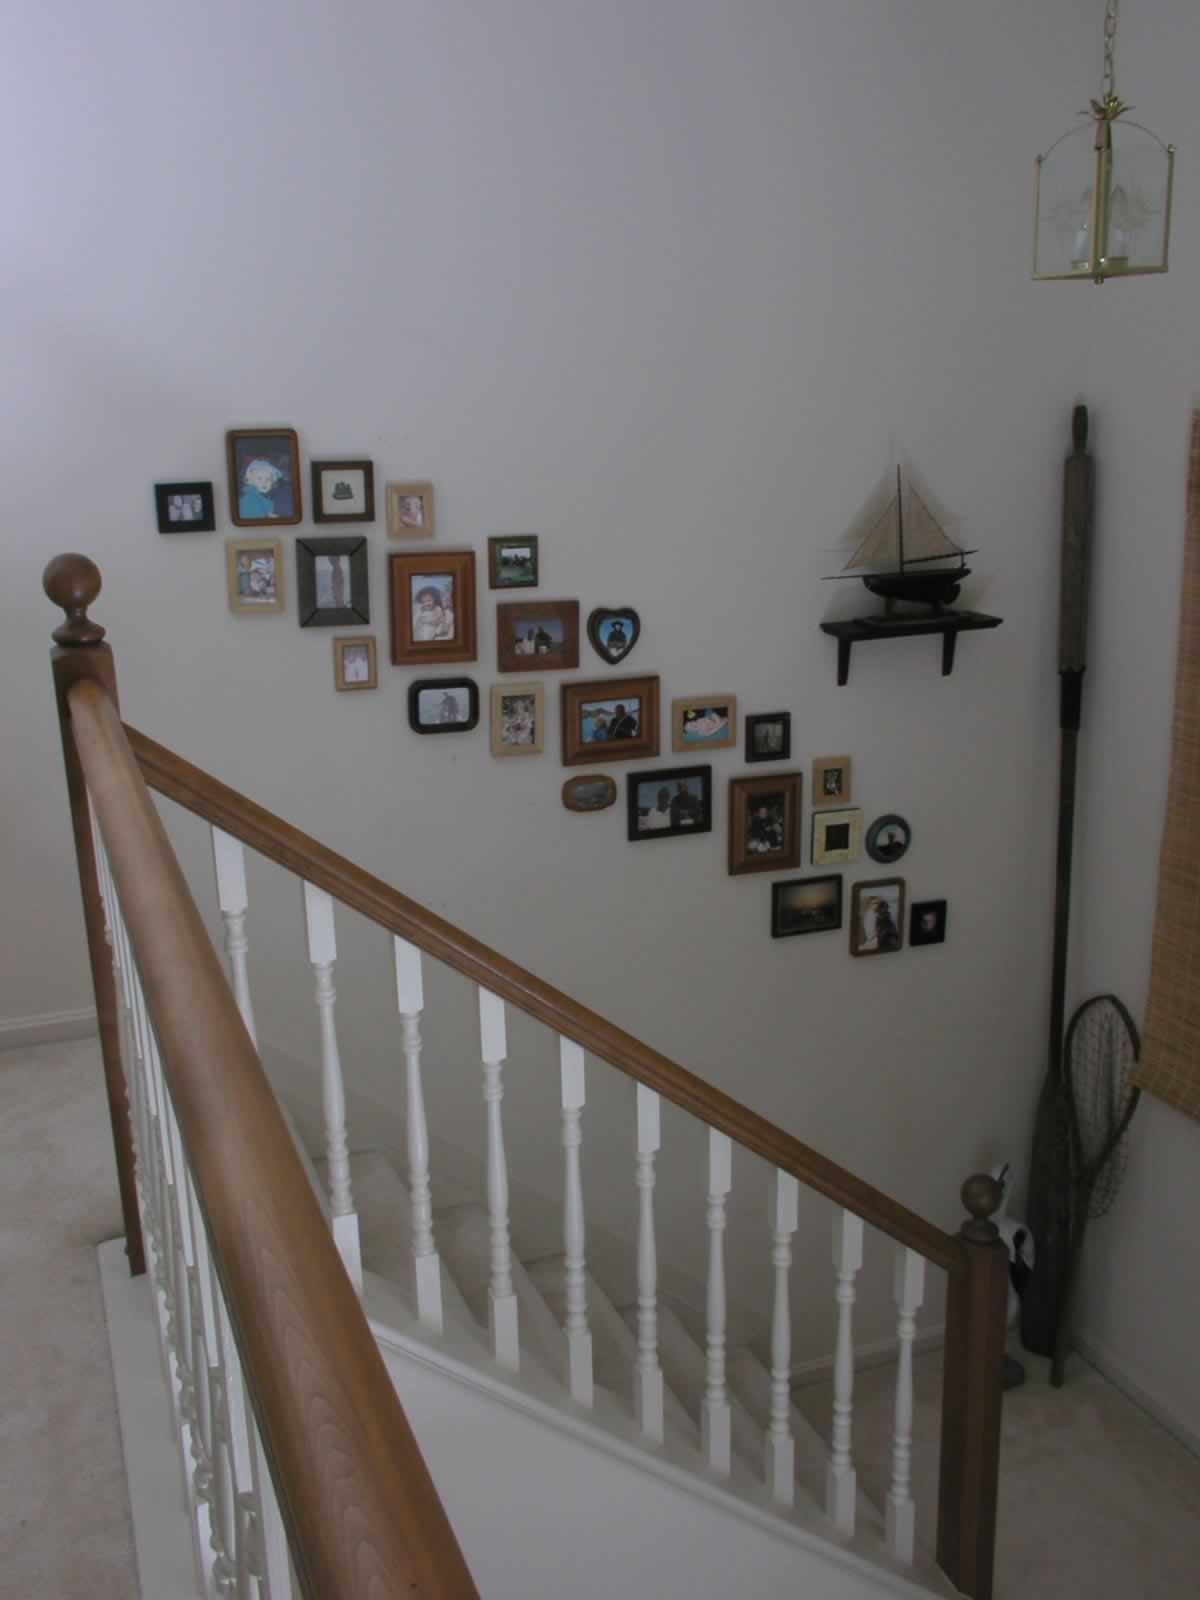 Picture hangers